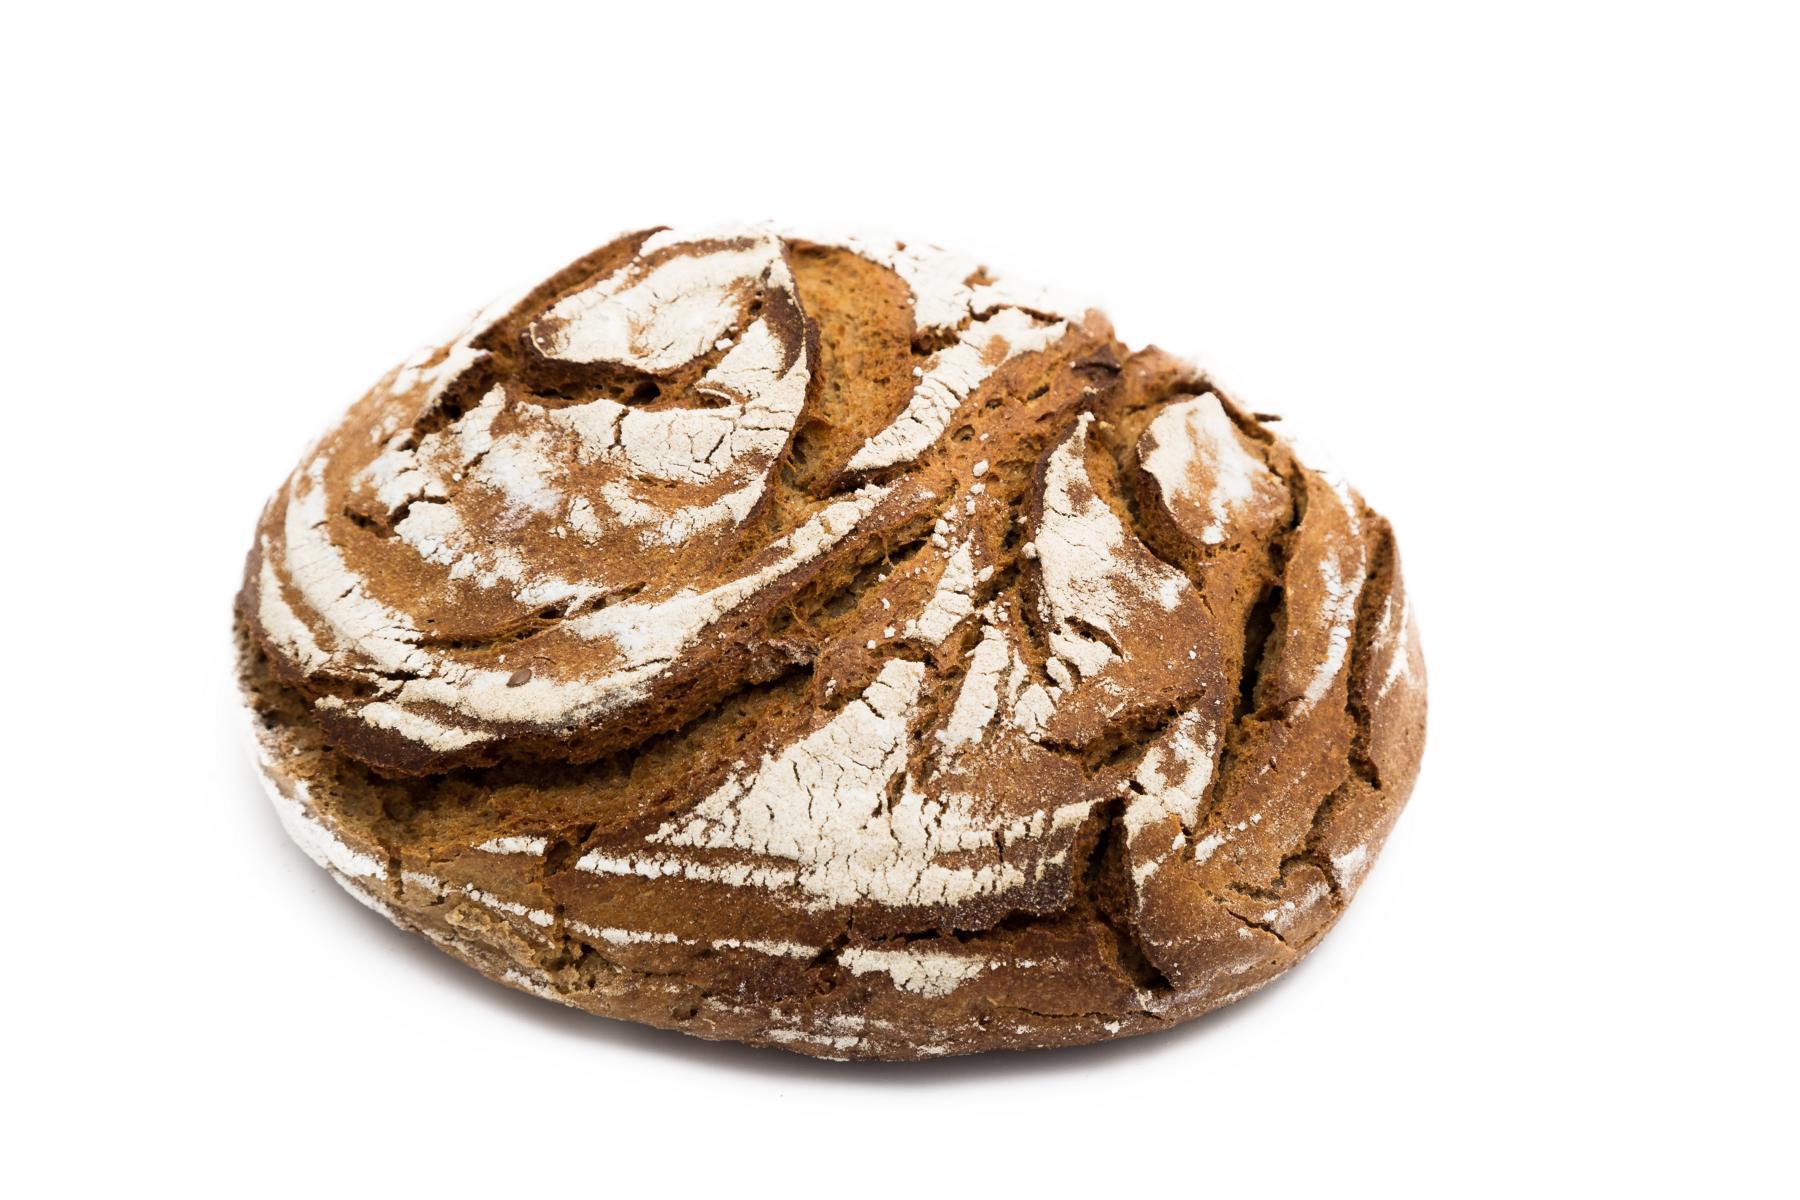 Kuchen Lieferservice Gildhuis Brot Traditionsbckerei In